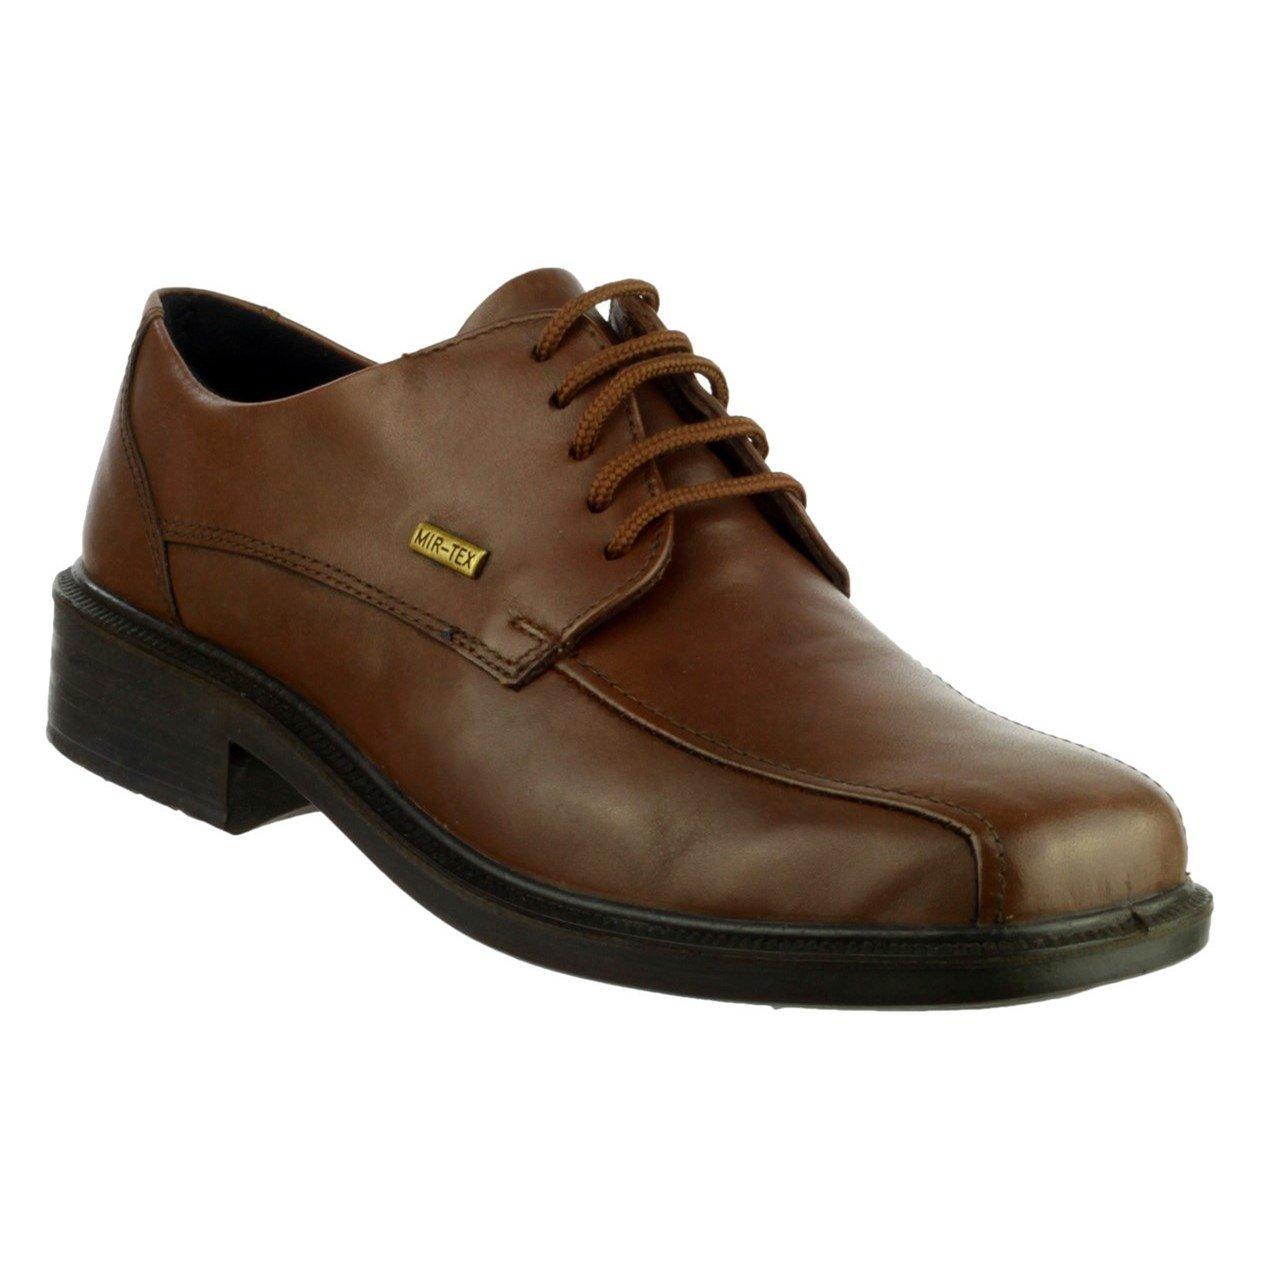 Cotswold Men's Stonehouse Waterproof Shoe Various Colours 32971 - Brown 10